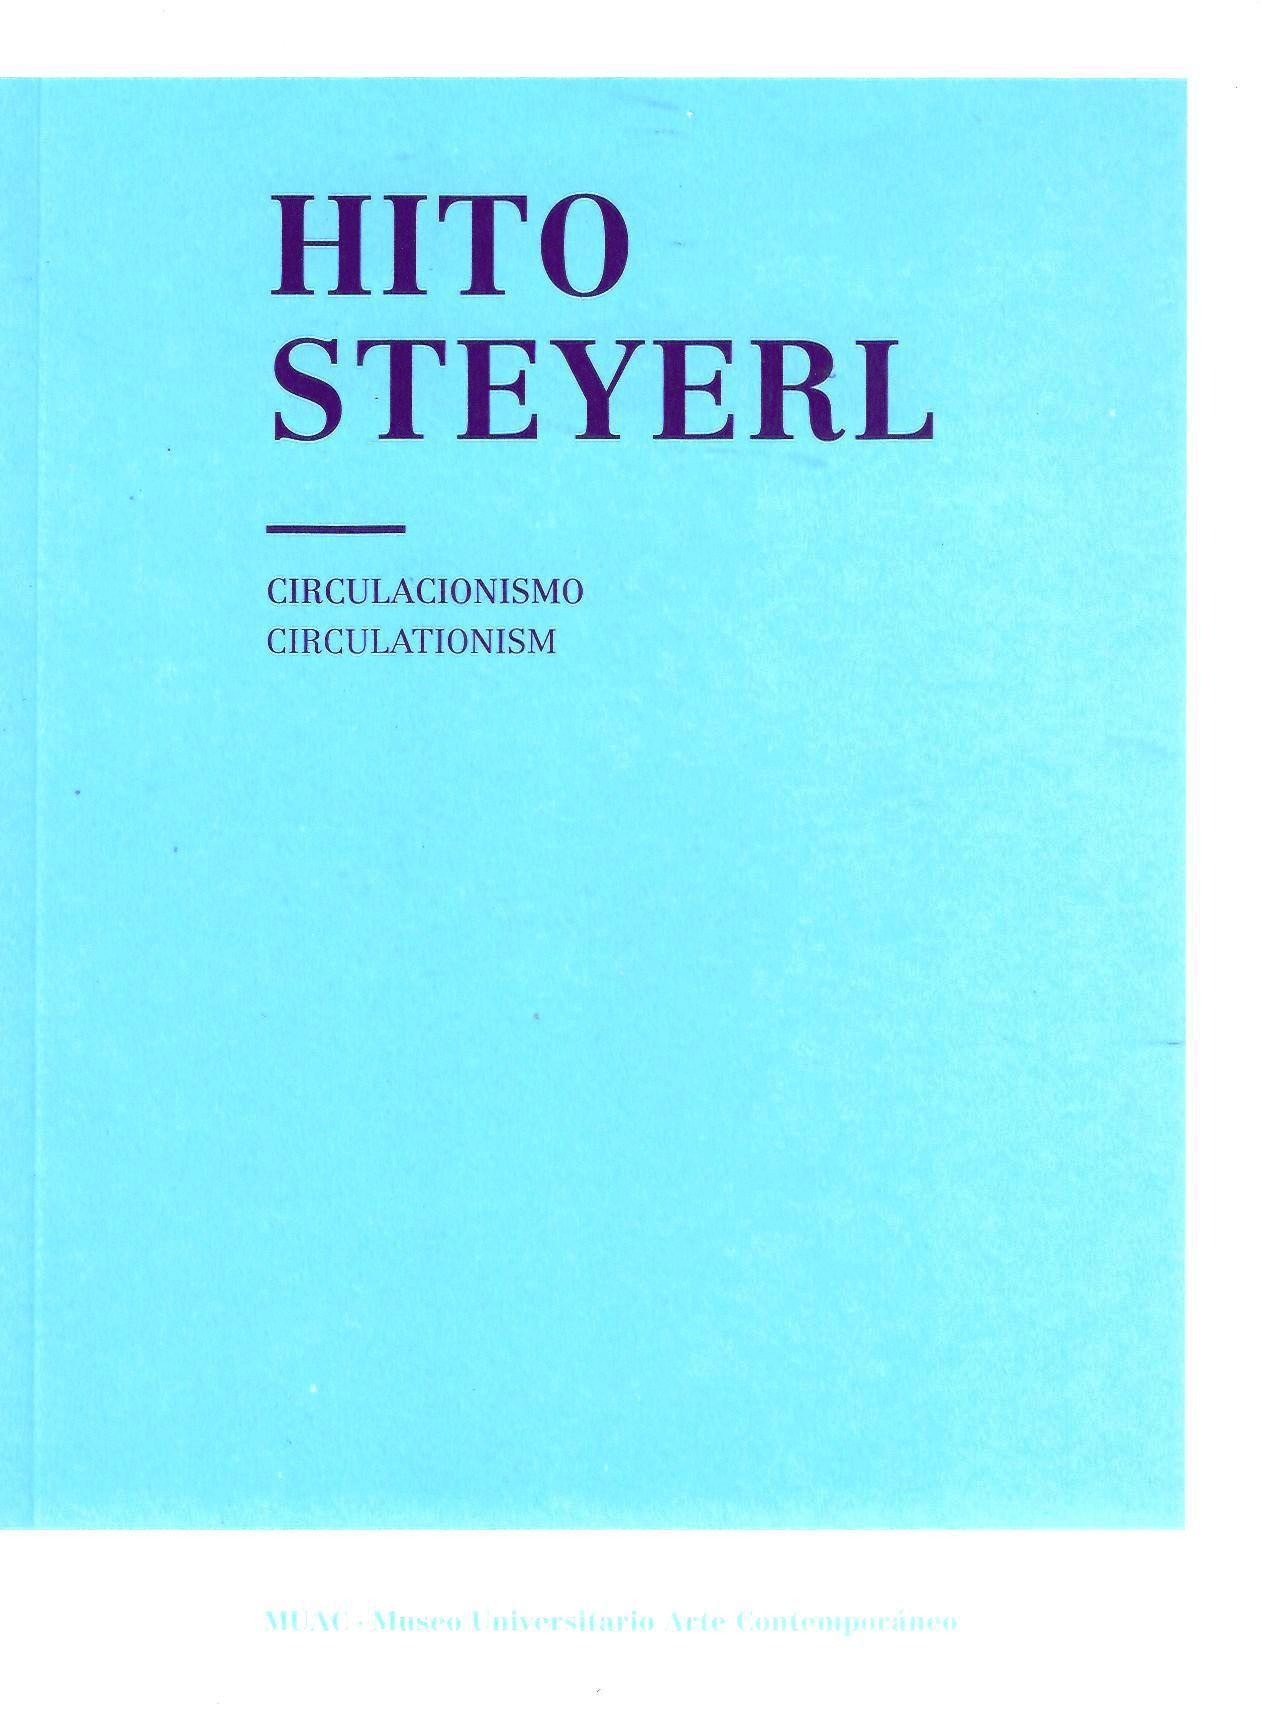 Hito Steyerl. Circulacionismo / Circulationism